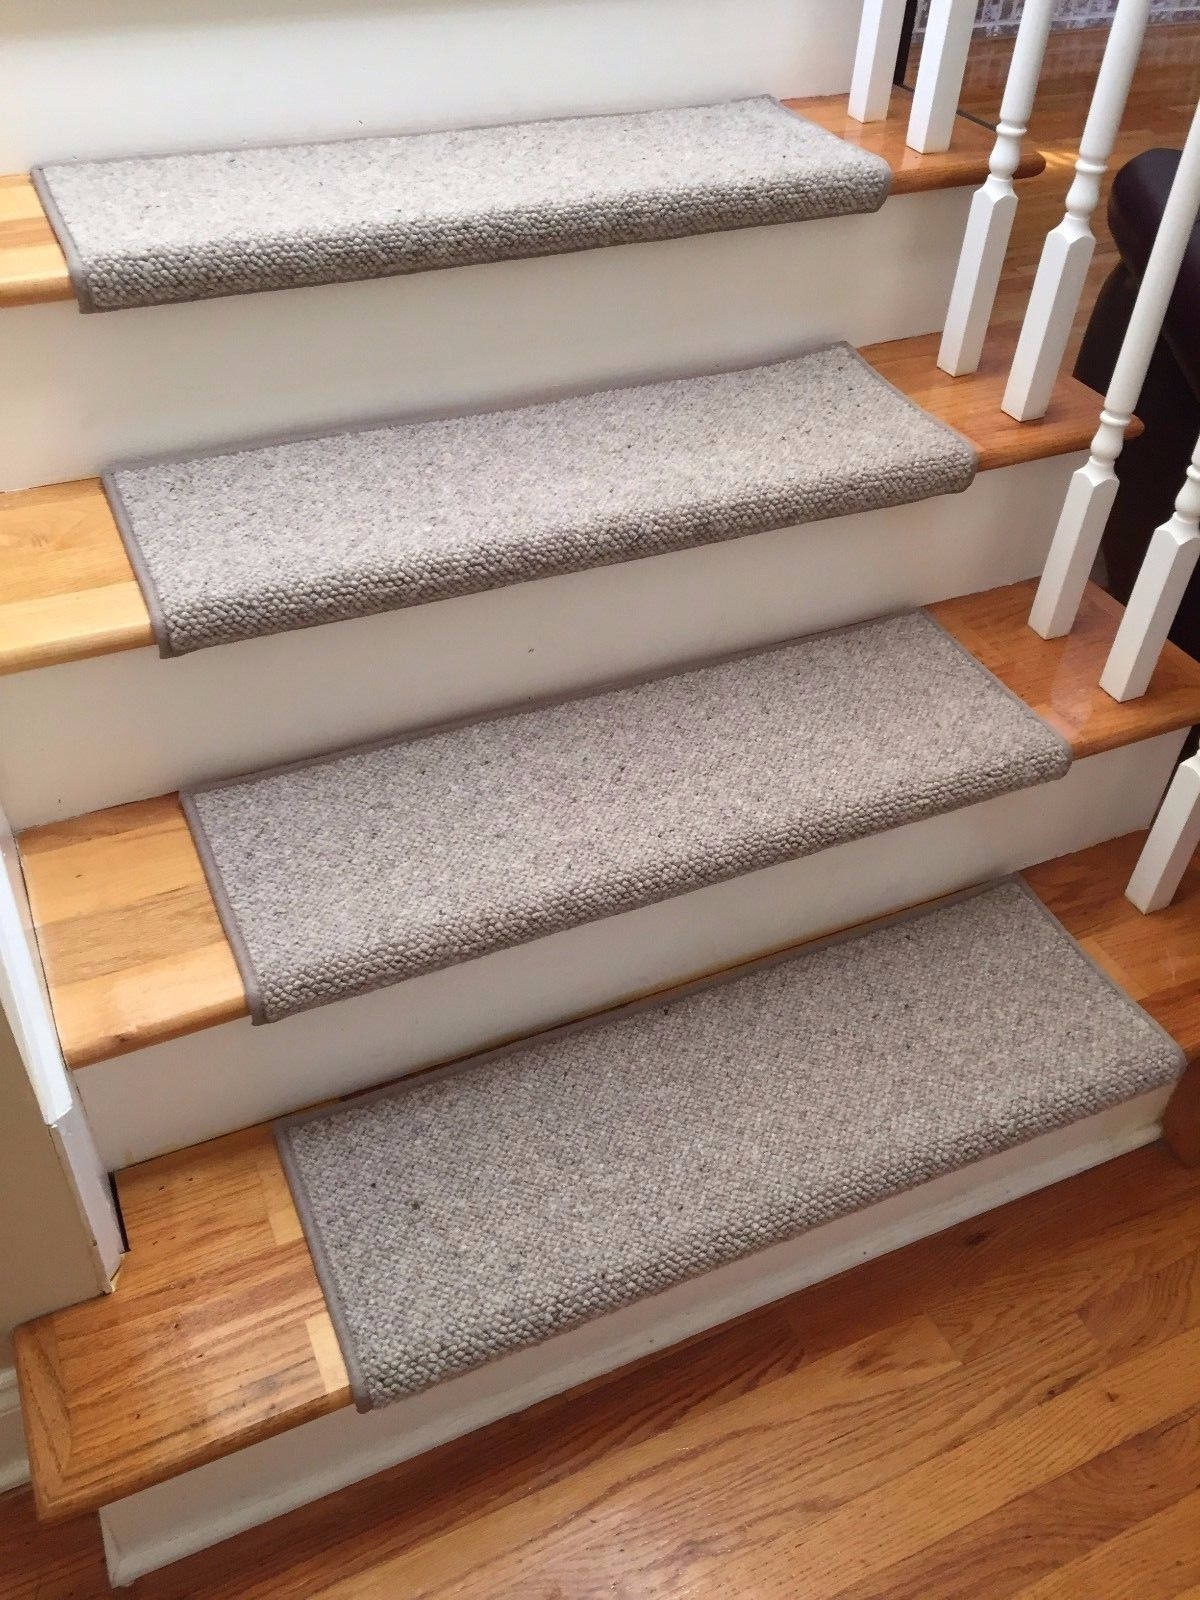 Alfa Stone 100 Wool True Bullnose™ Padded Carpet Stair Tread | Best Carpet Stair Treads | Rug | Mat | Treads Lowes | Bullnose Stair | Wood Stairs